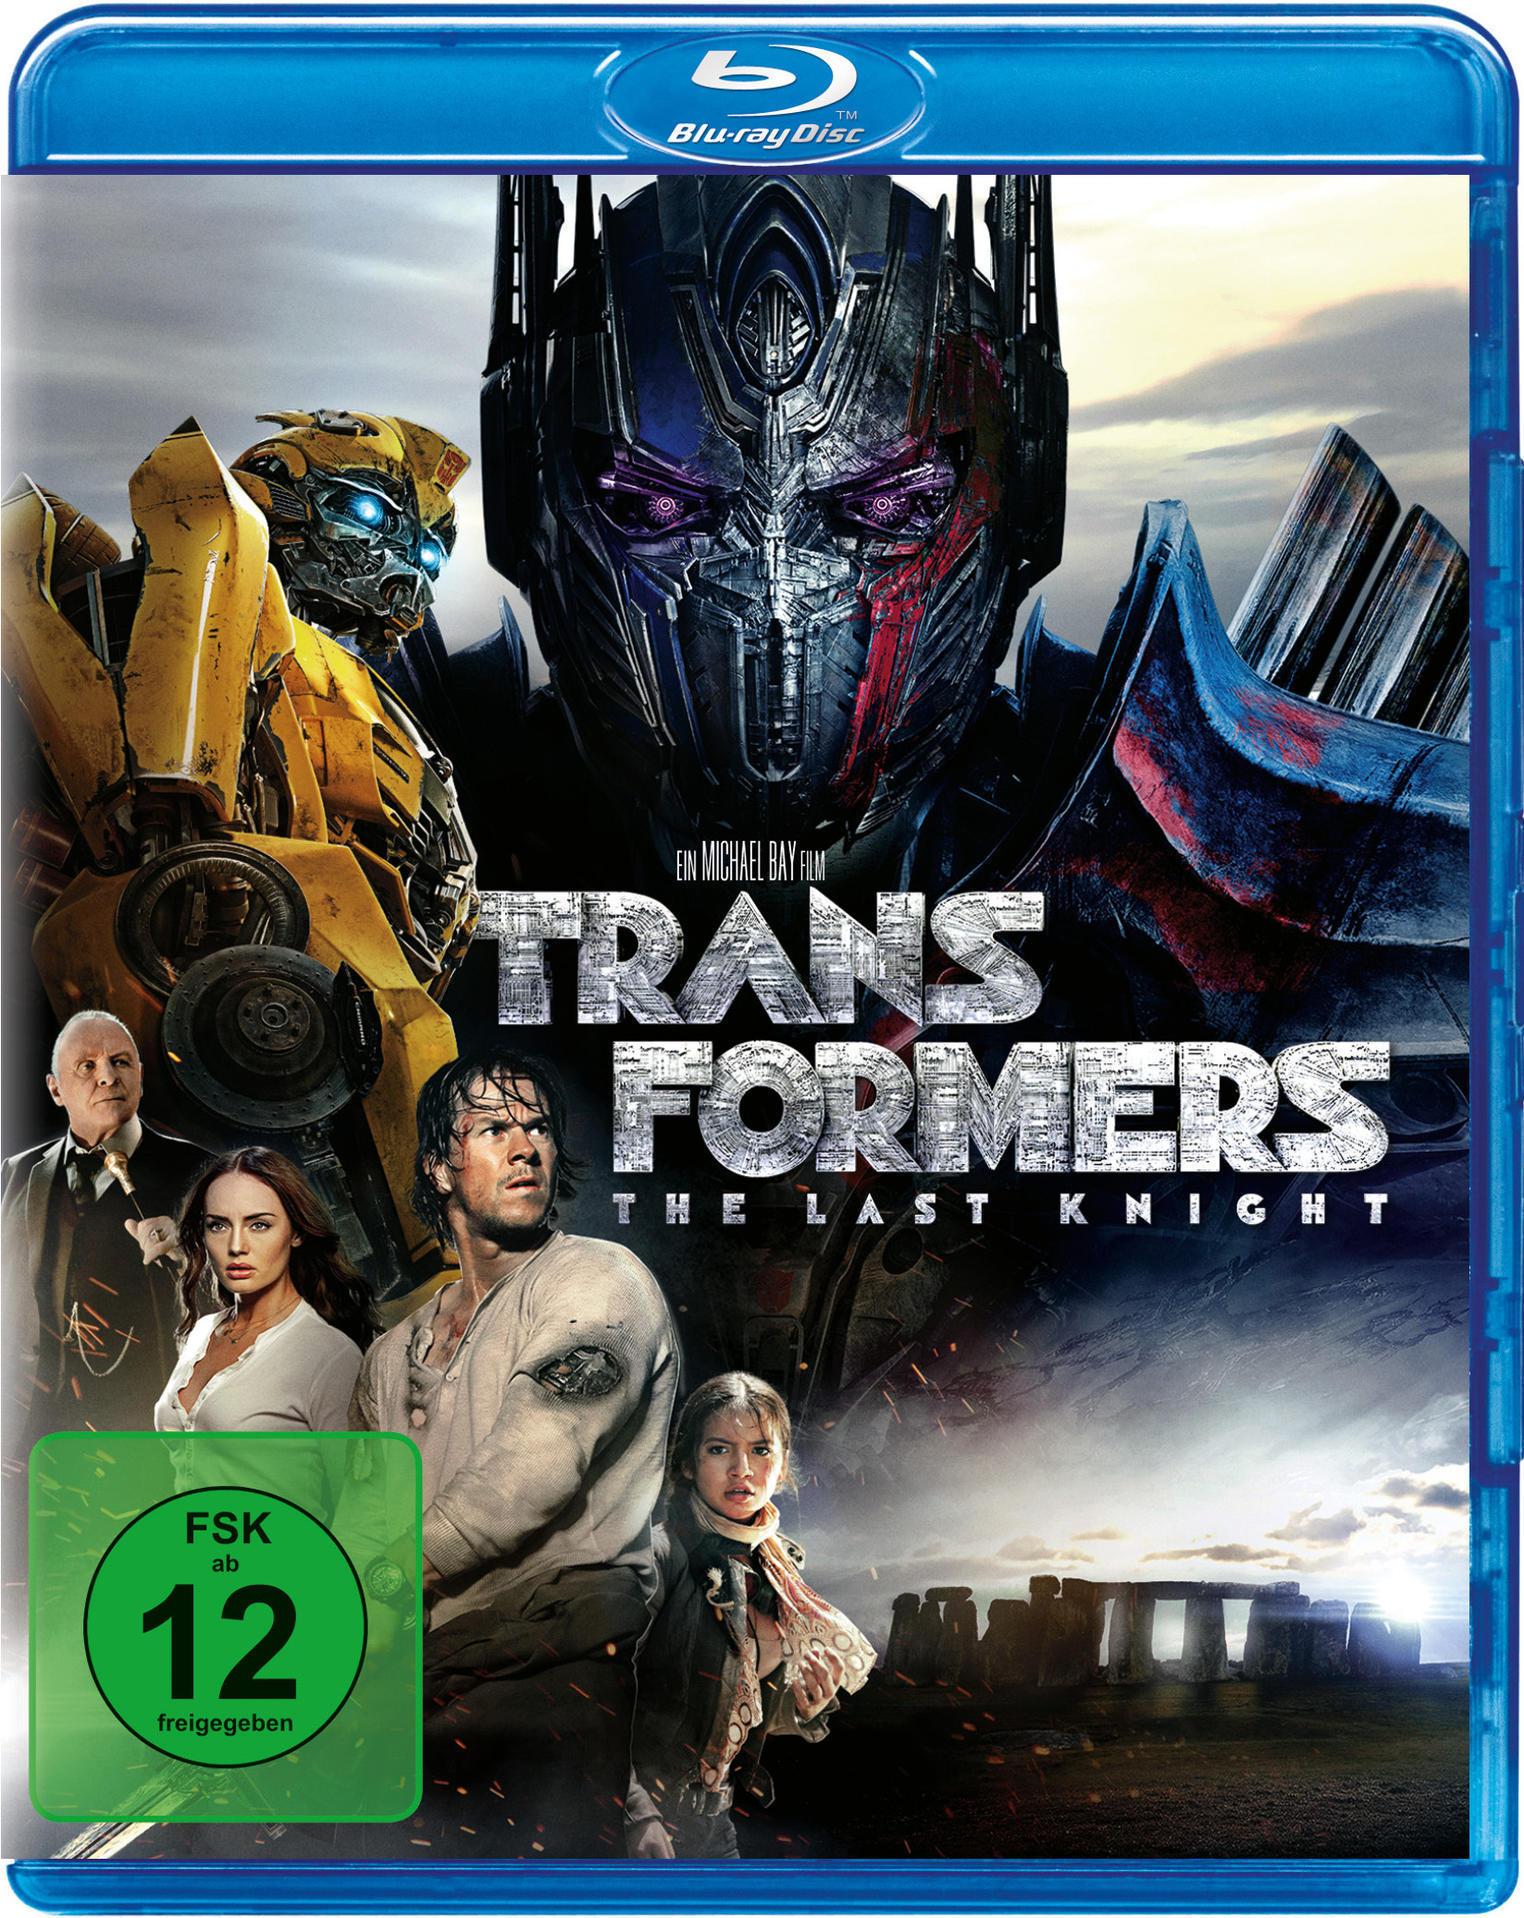 Transformers: The Last Knight - 2 Disc Bluray (BLU-RAY) für 11,99 Euro